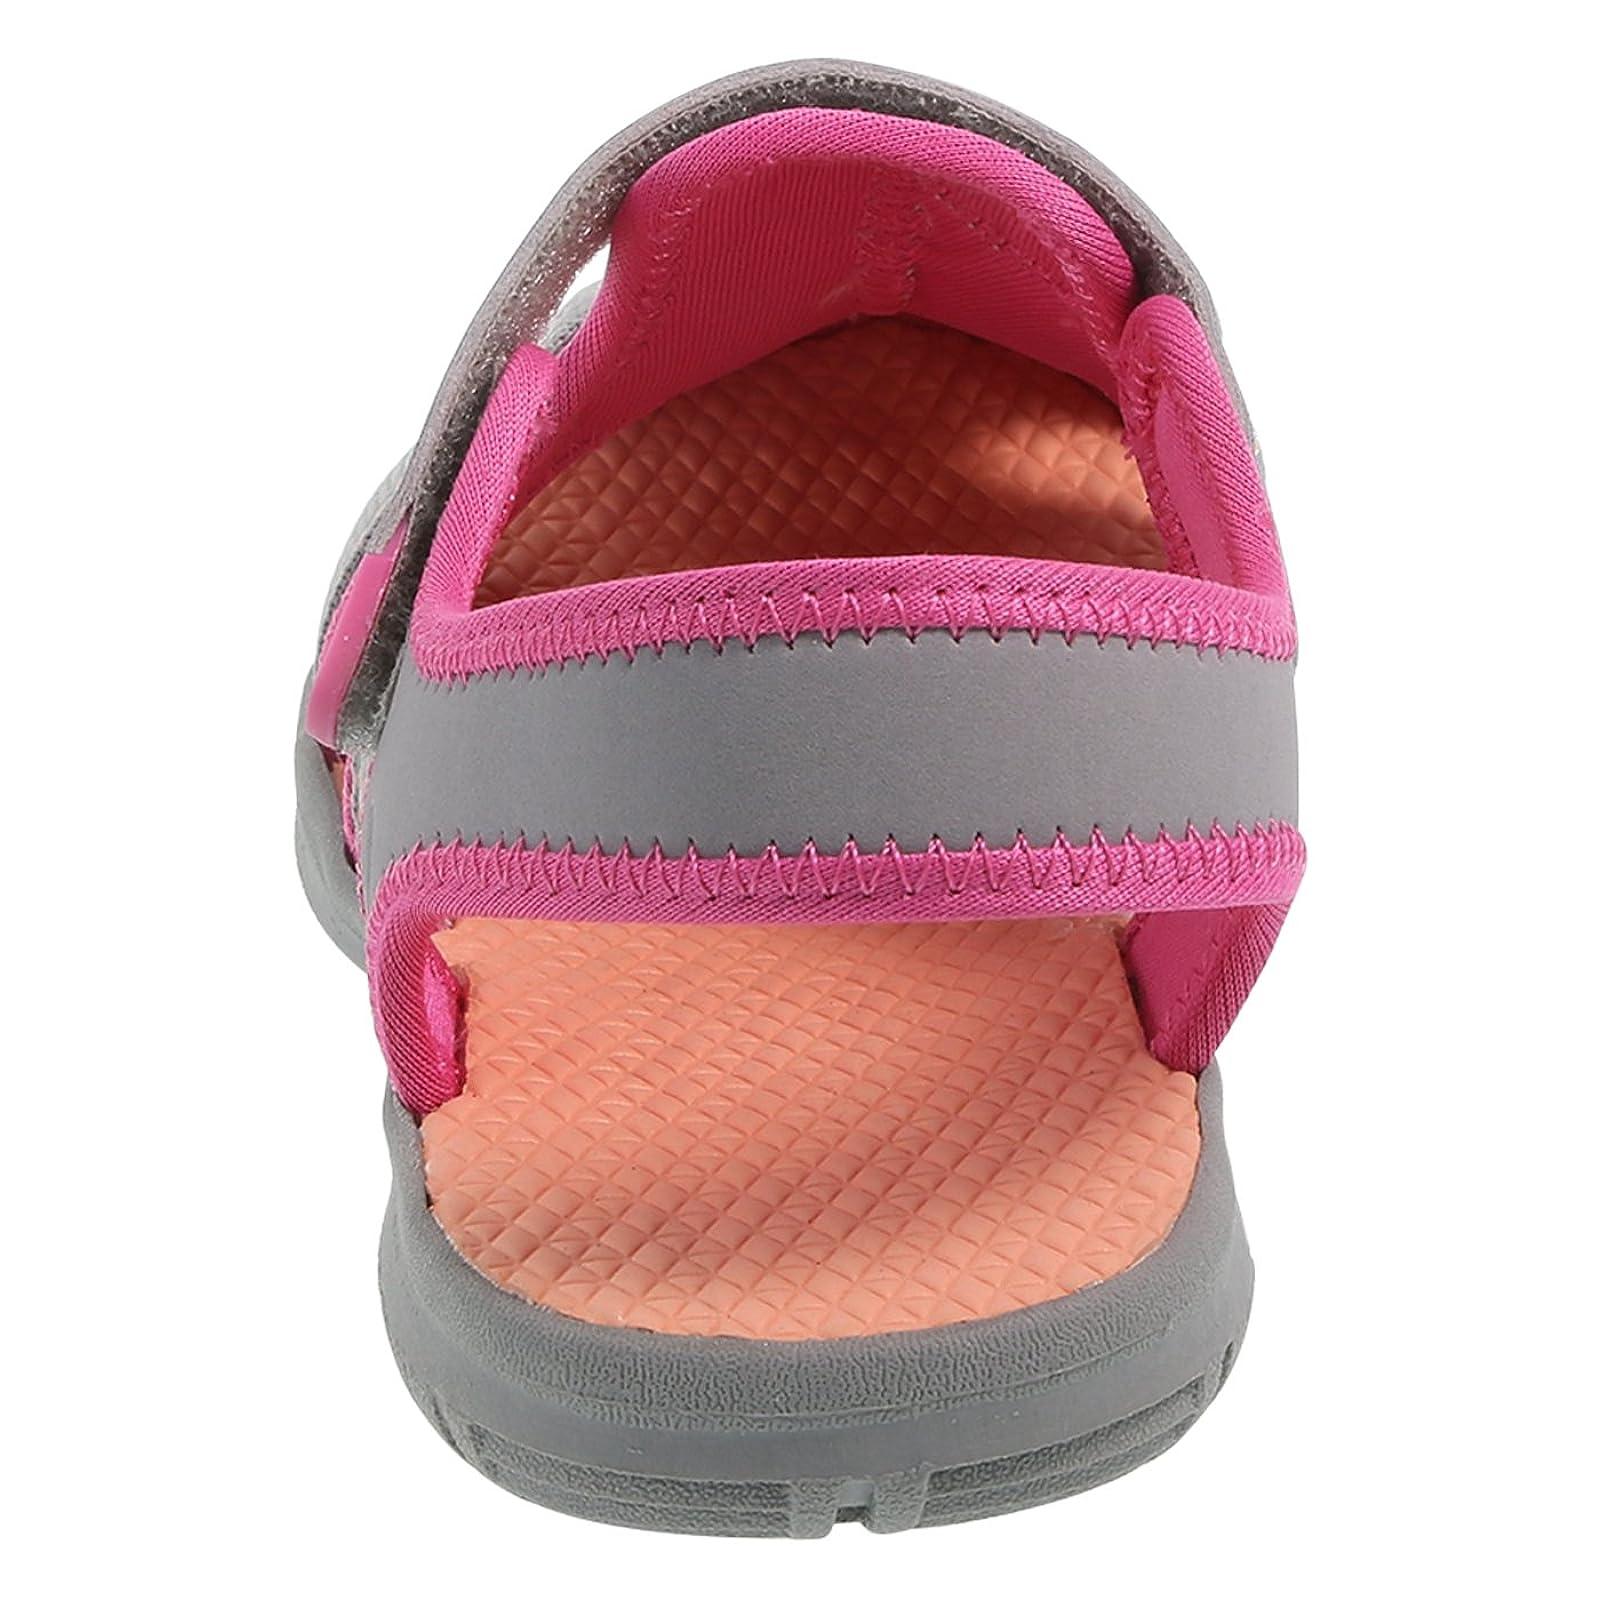 Rugged Outback Grey Pink Girls' Marina Bumptoe 175191040 - 2